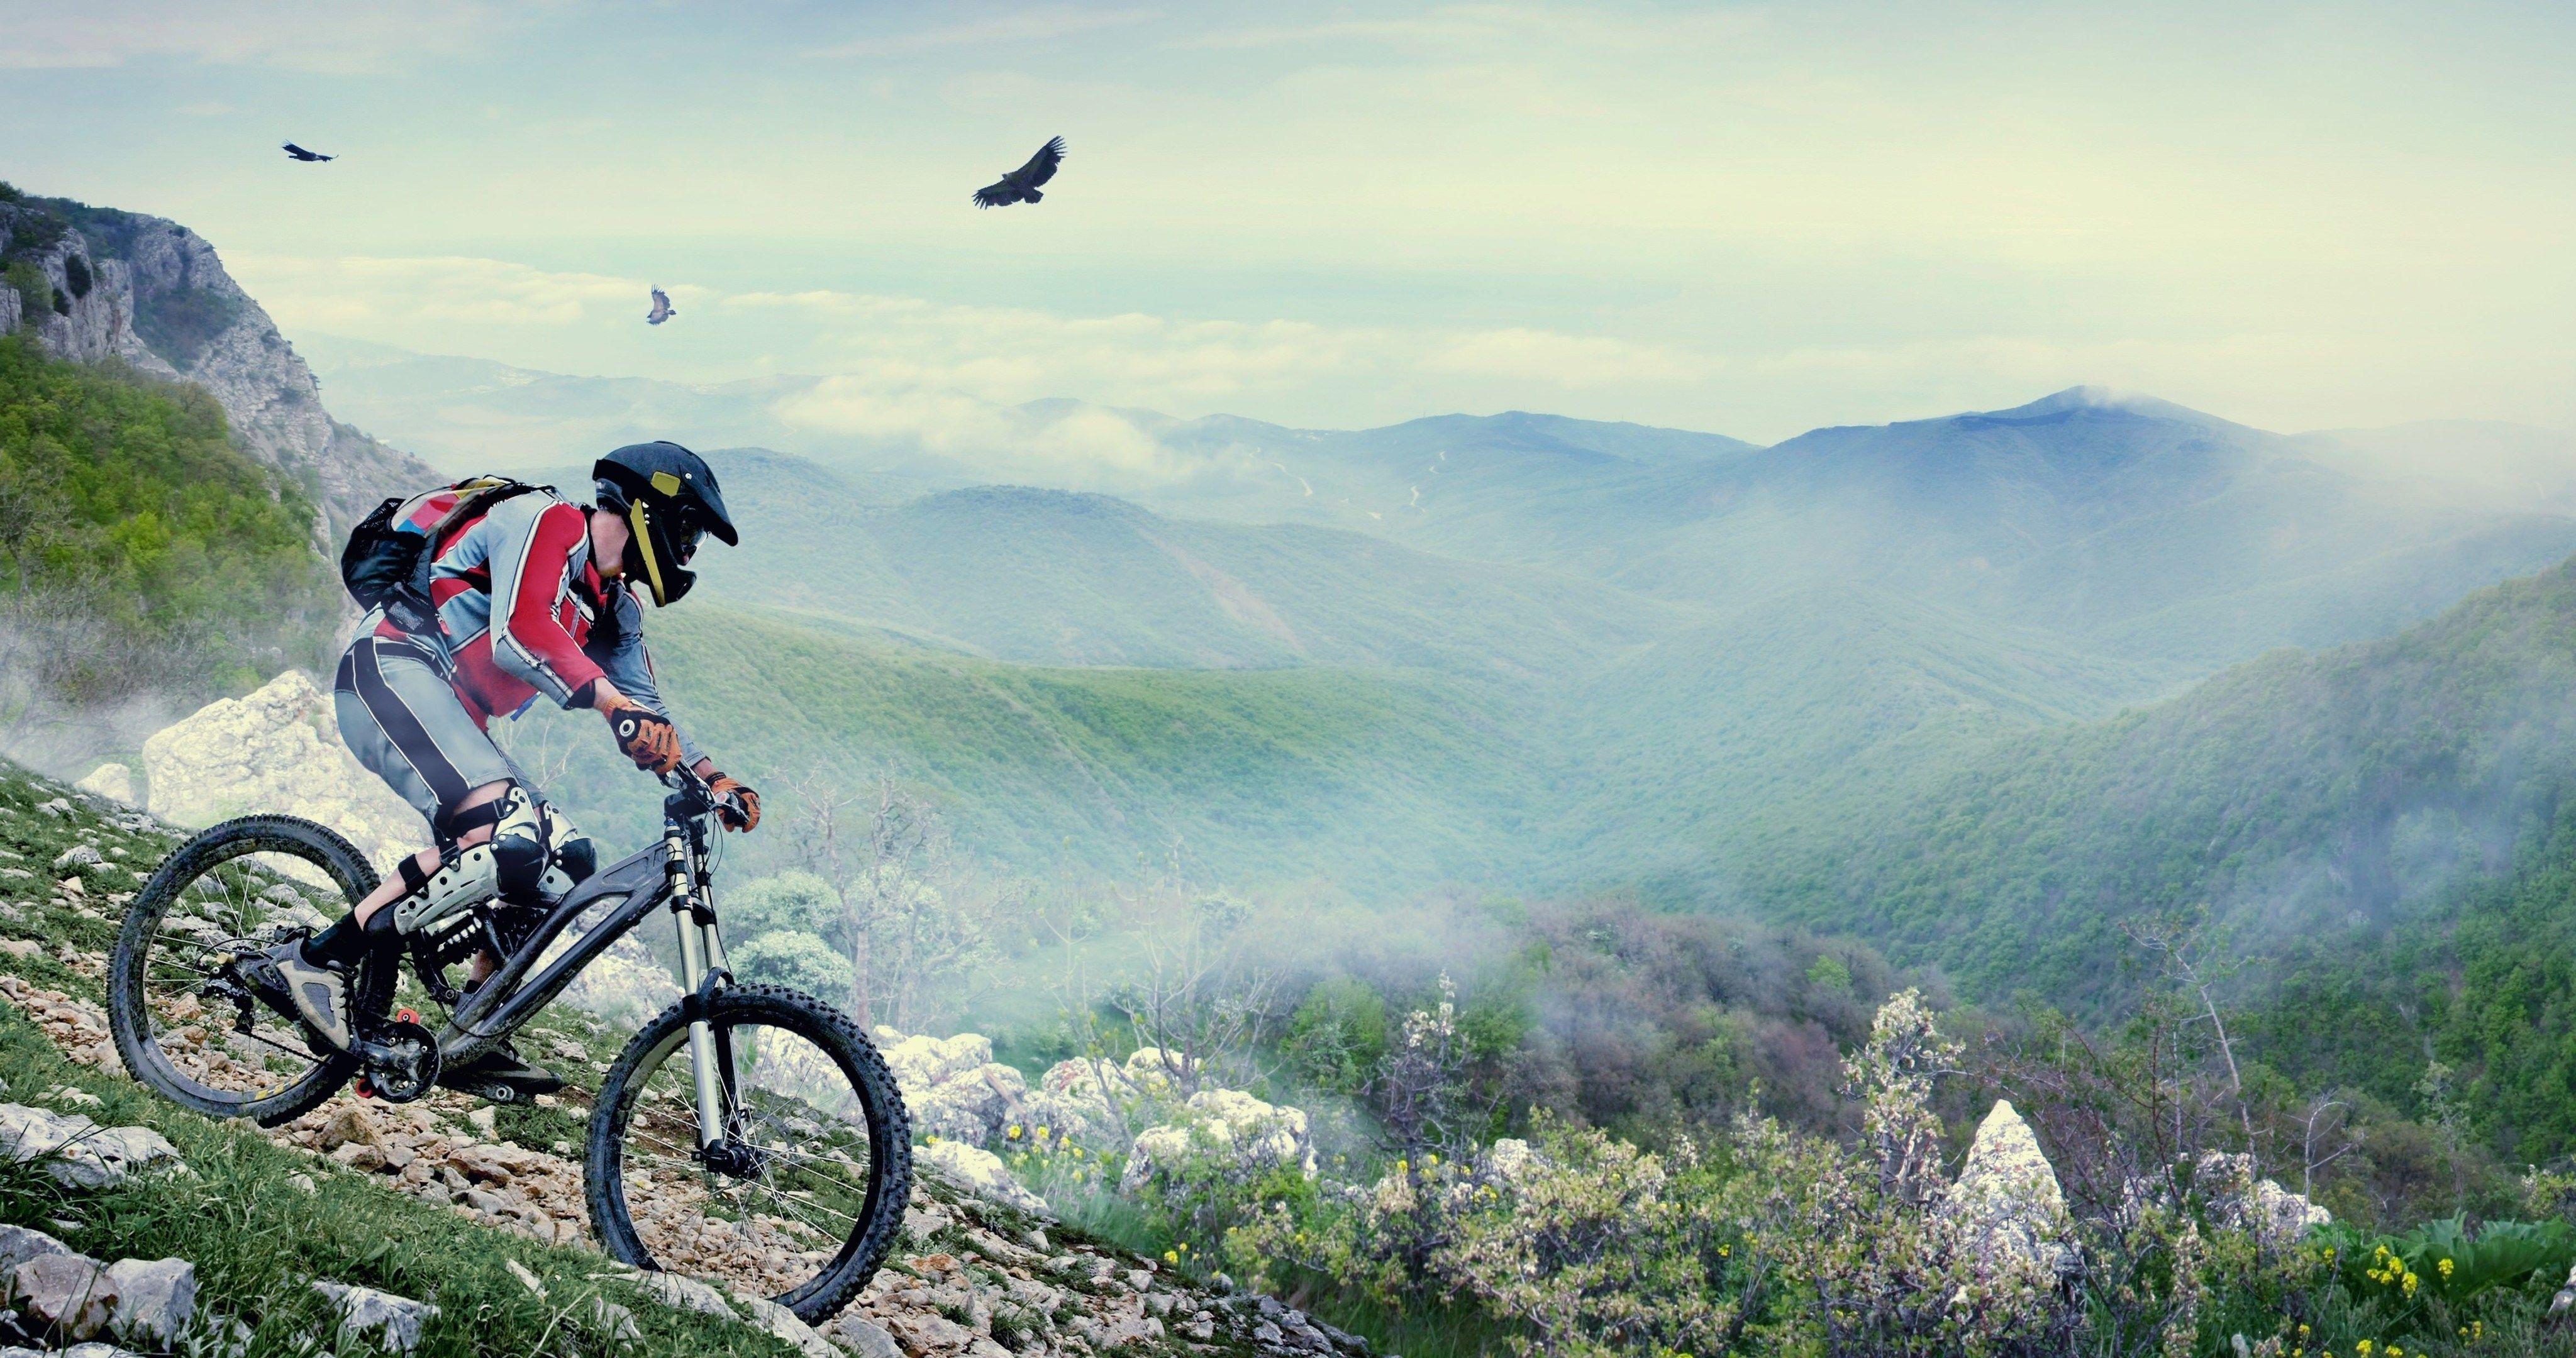 bicycle man 4k ultra hd wallpaper | Bicycle race, Bicycle ...